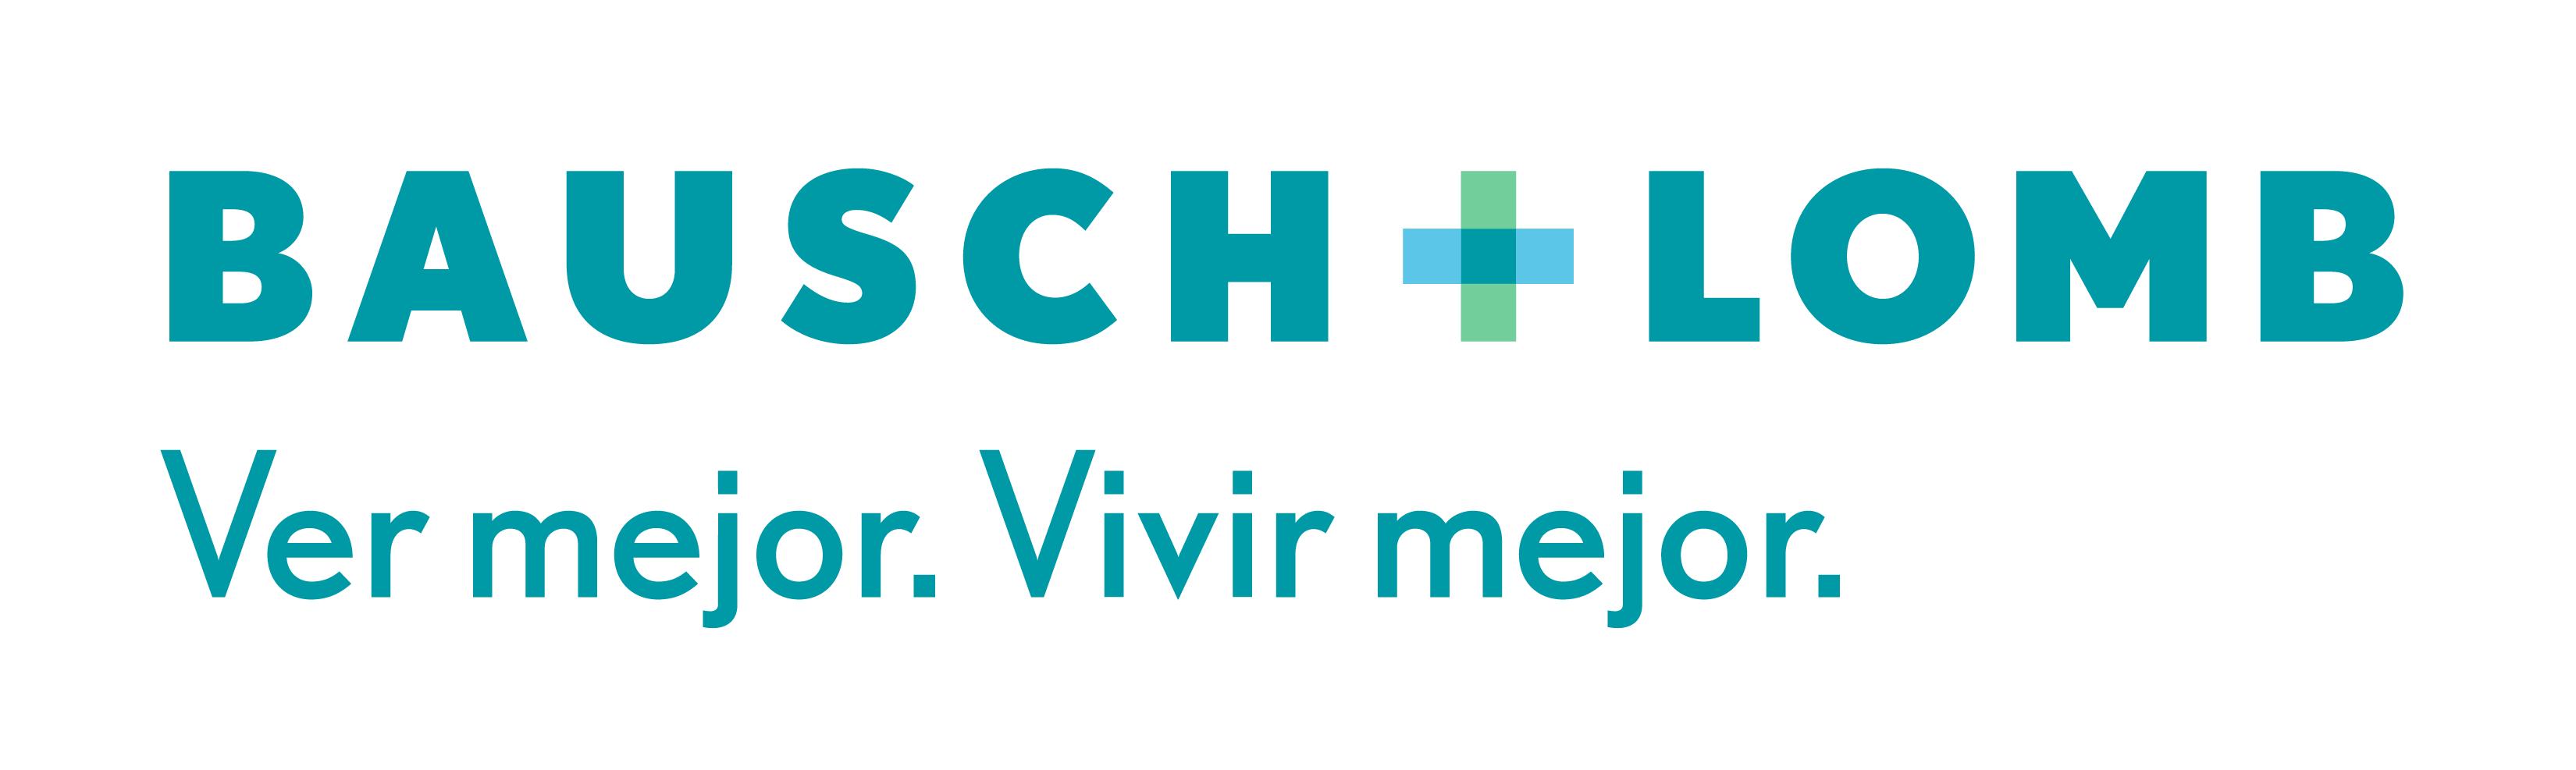 BL_Corporate_logo_Tag_Spanish_Argentina